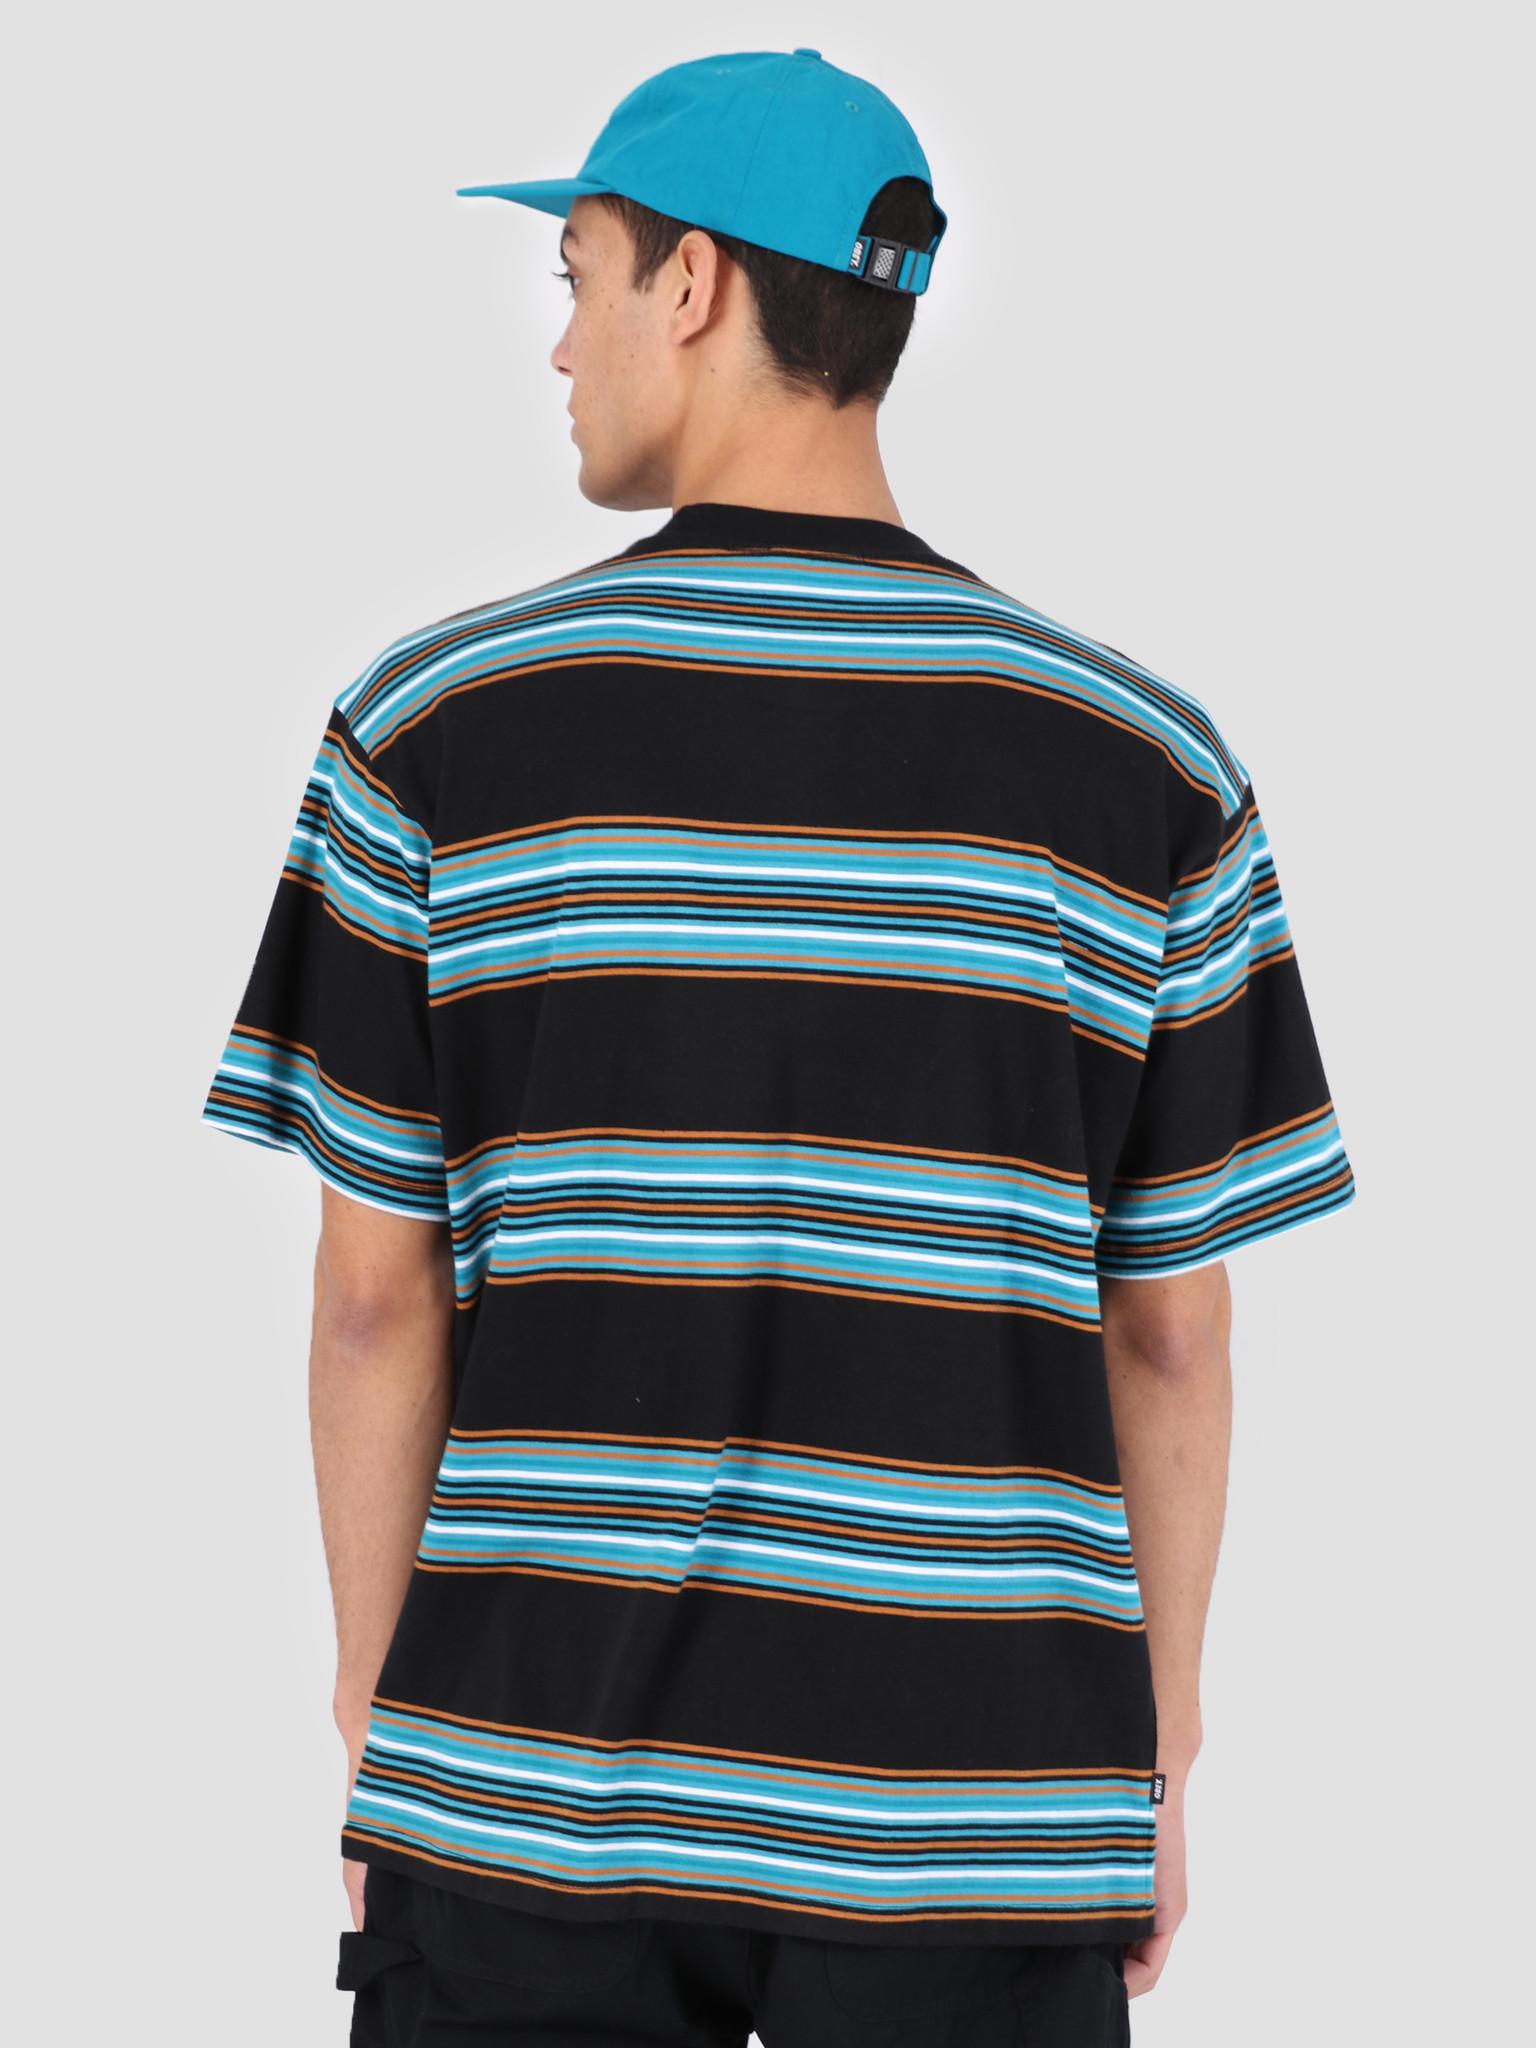 Obey Obey Route Claic T-Shirt BKM 131080238